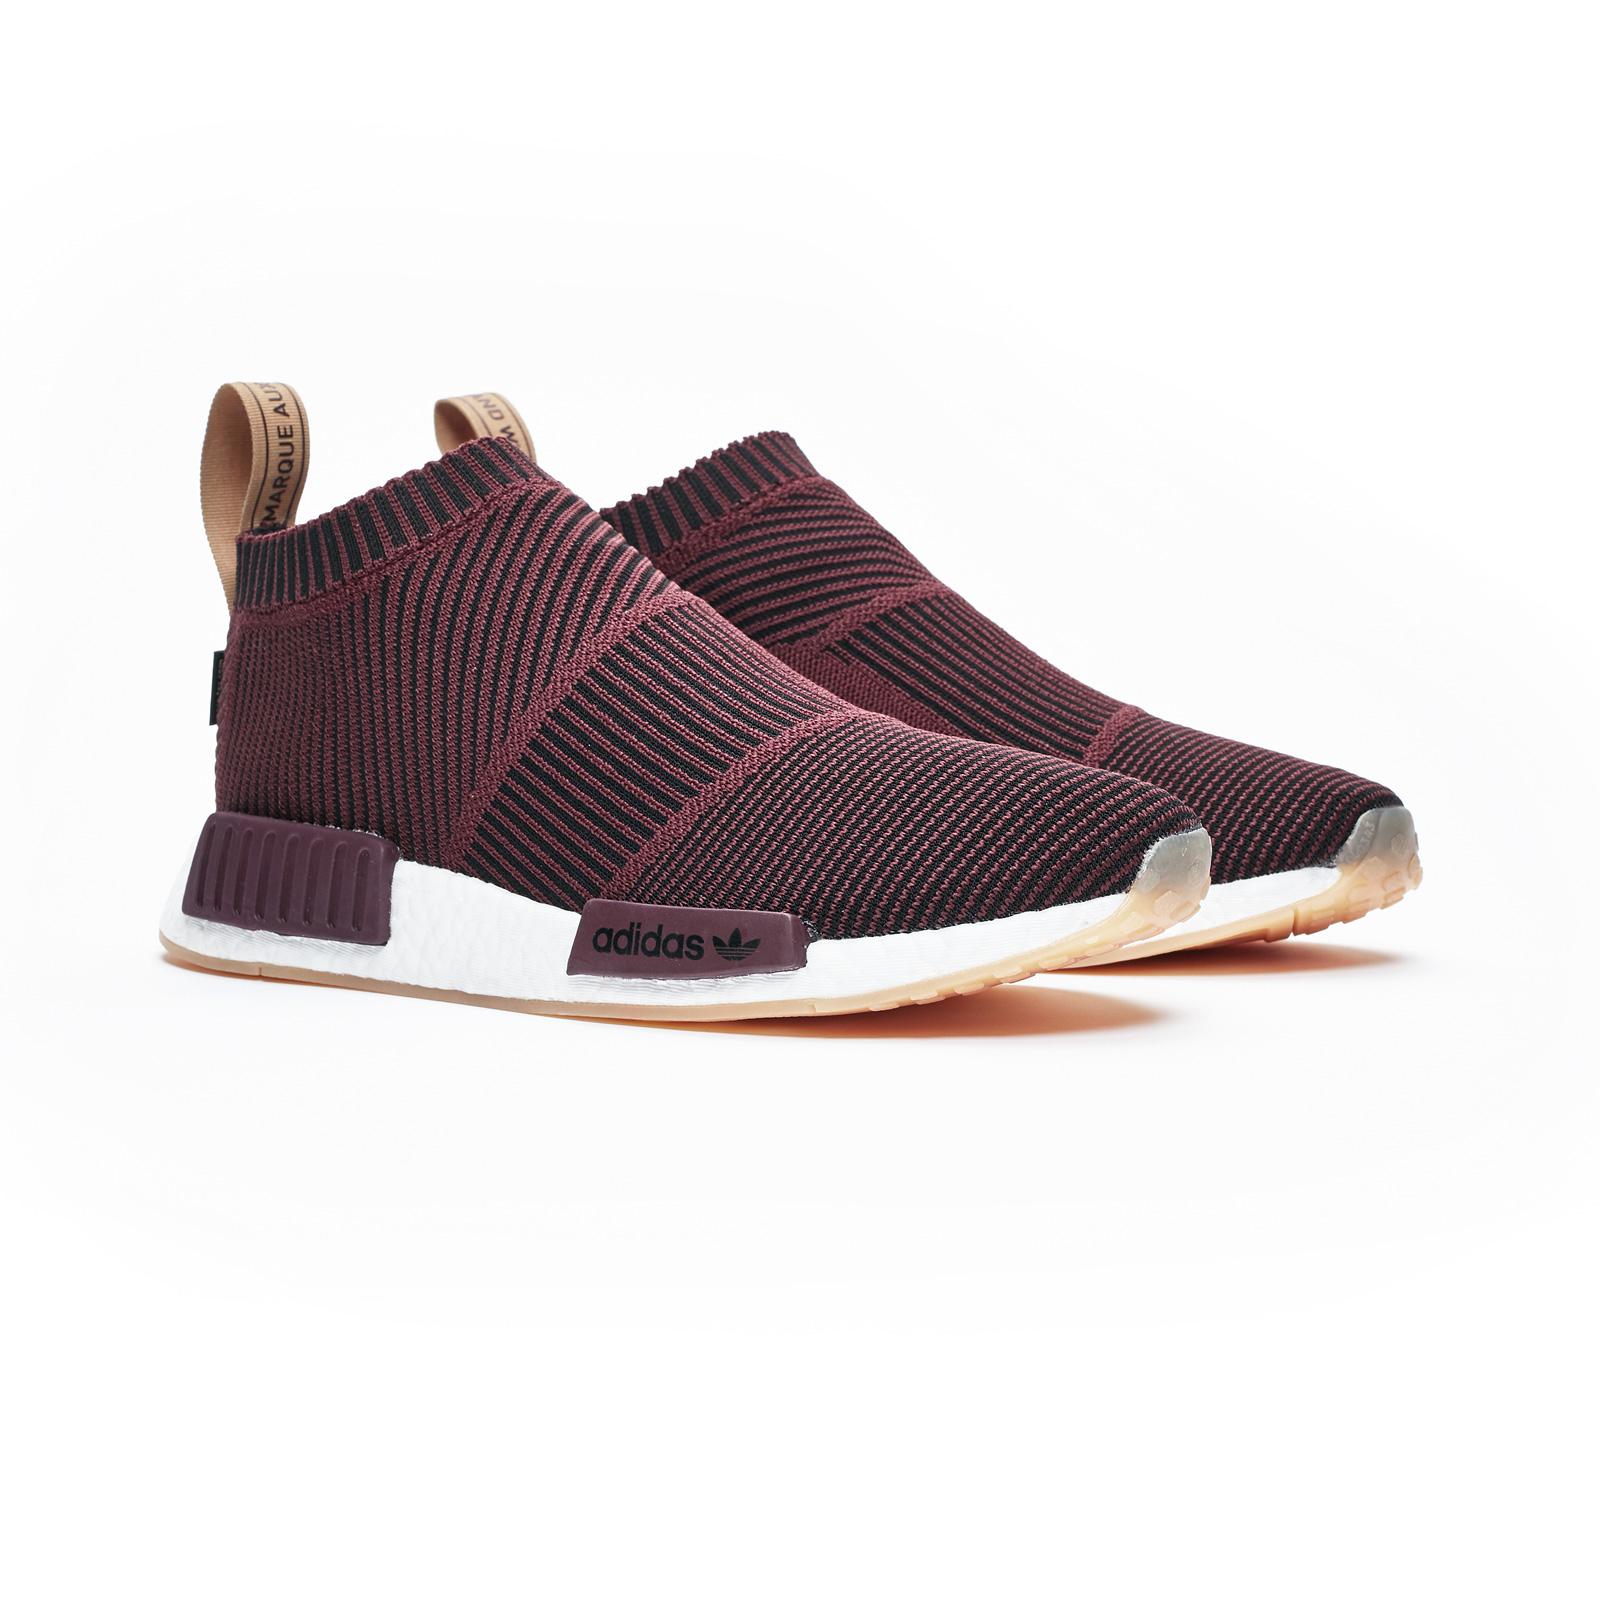 7a378b66e5dc1 adidas NMD CS1 GORE-TEX Primeknit SNS Exclusive - Aq0364 - Sneakersnstuff